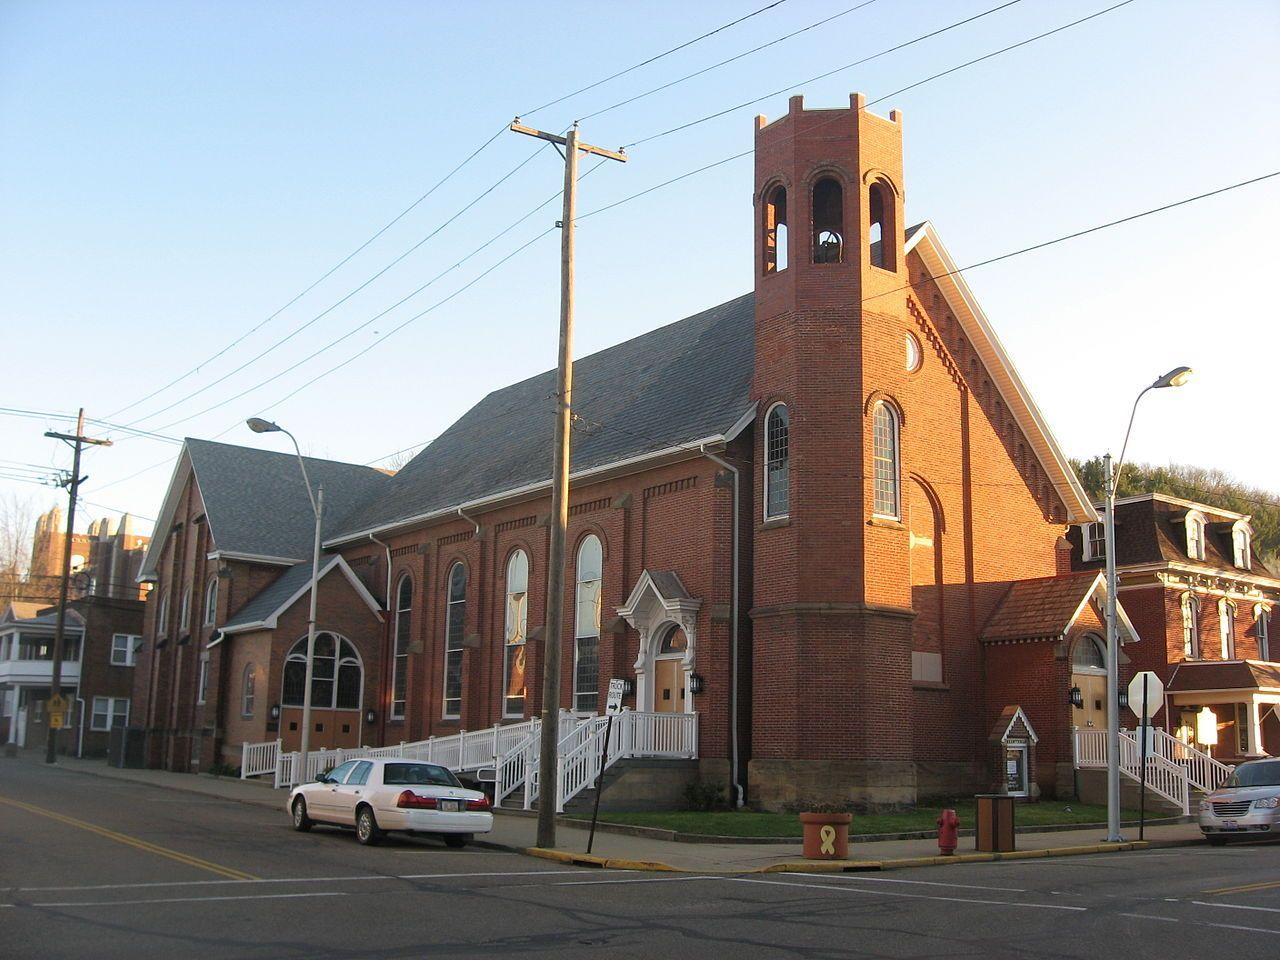 The Railway Chapel in Tuscarawas County, Ohio. National